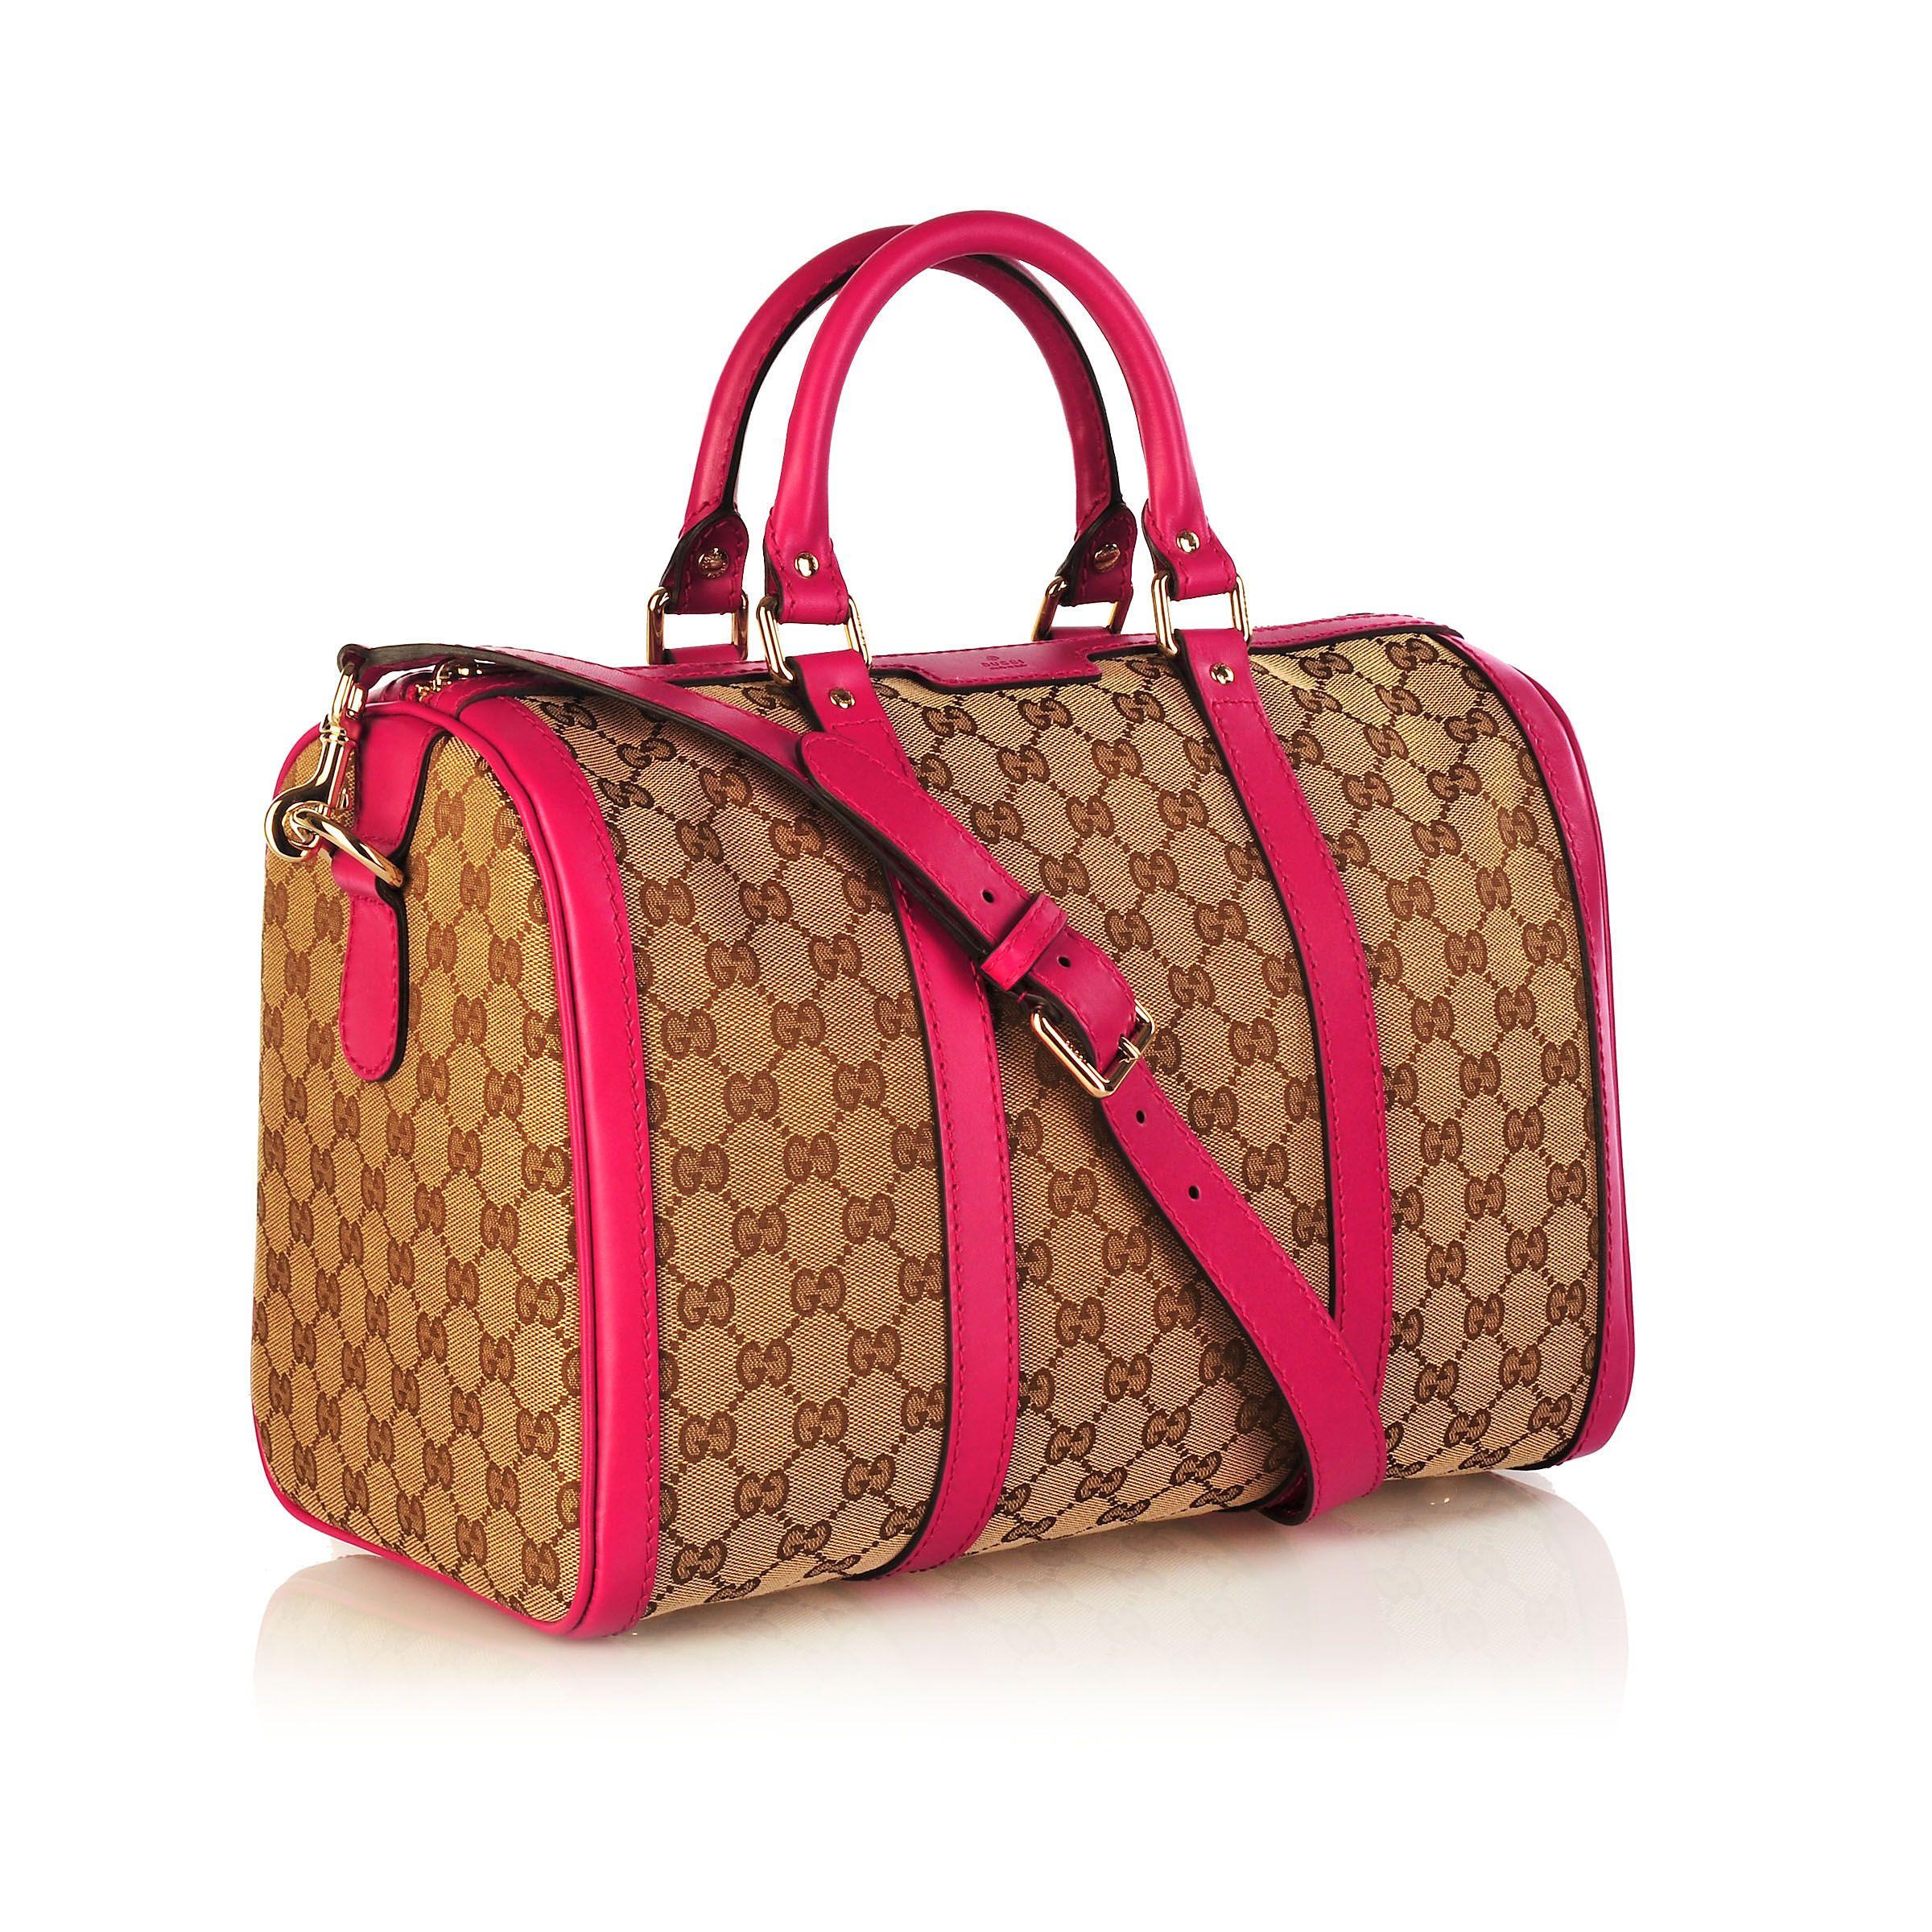 5bc5b39fdd54 Buy Gucci Vintage Web Original GG Bowling Bag in India. | Gucci ...